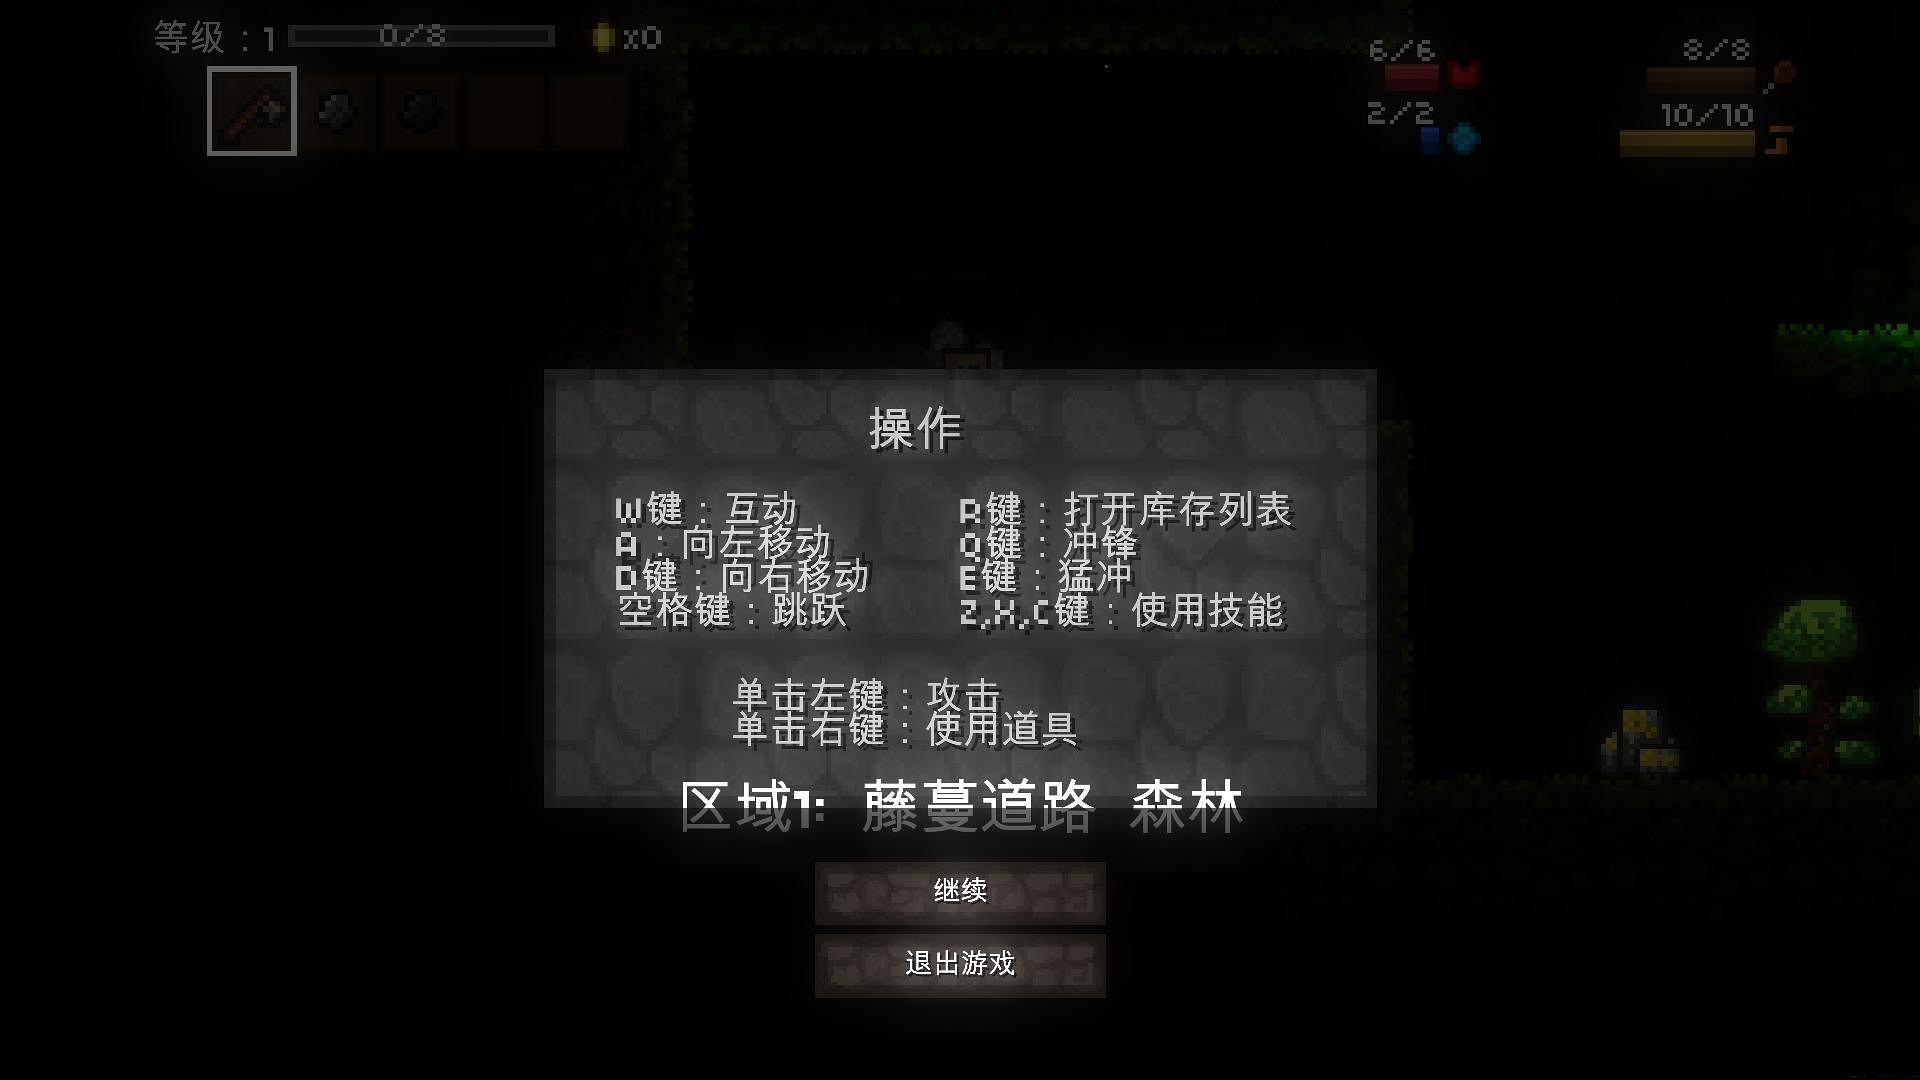 moc3041中文资料